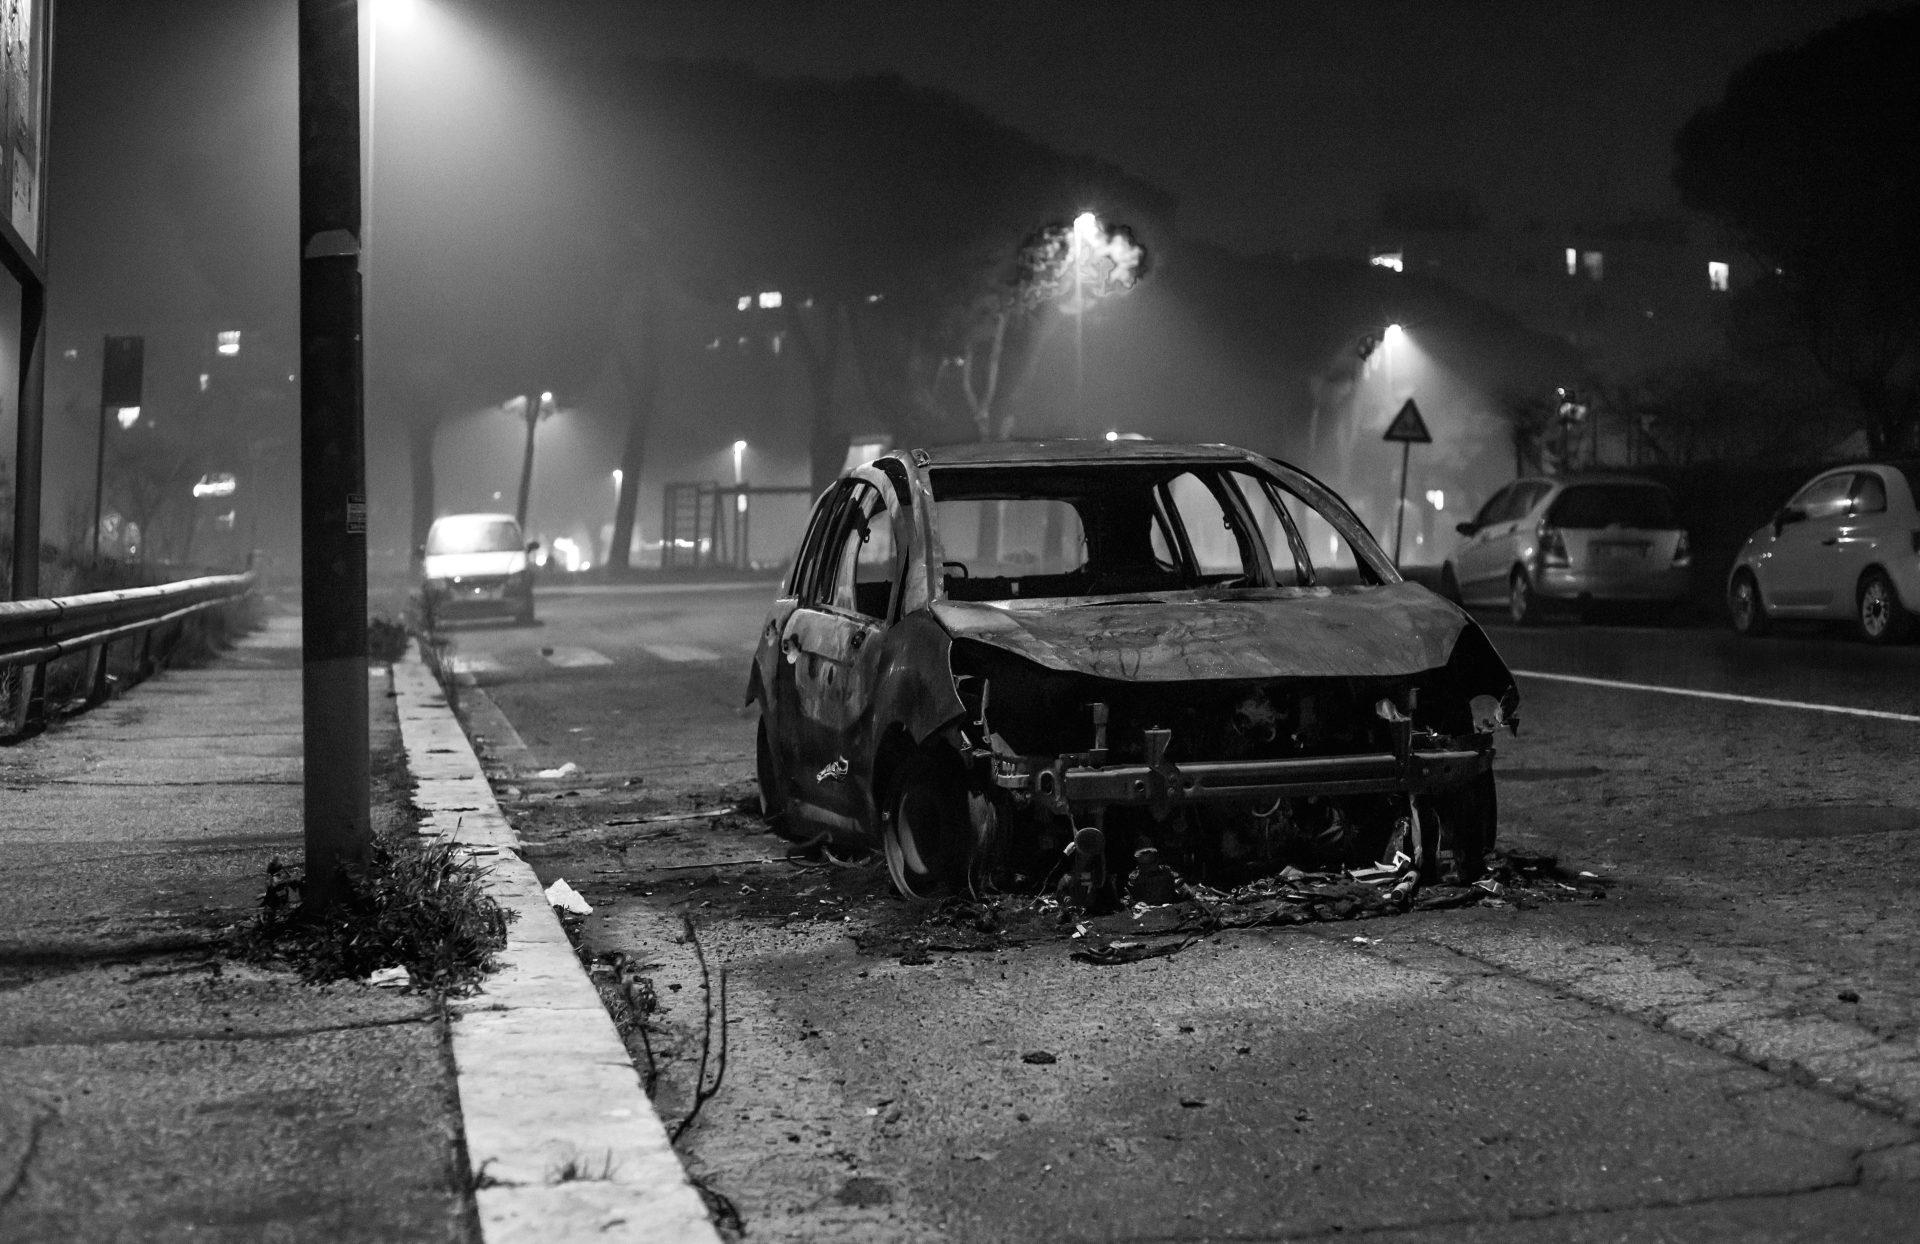 Roma, carcasse del 2017